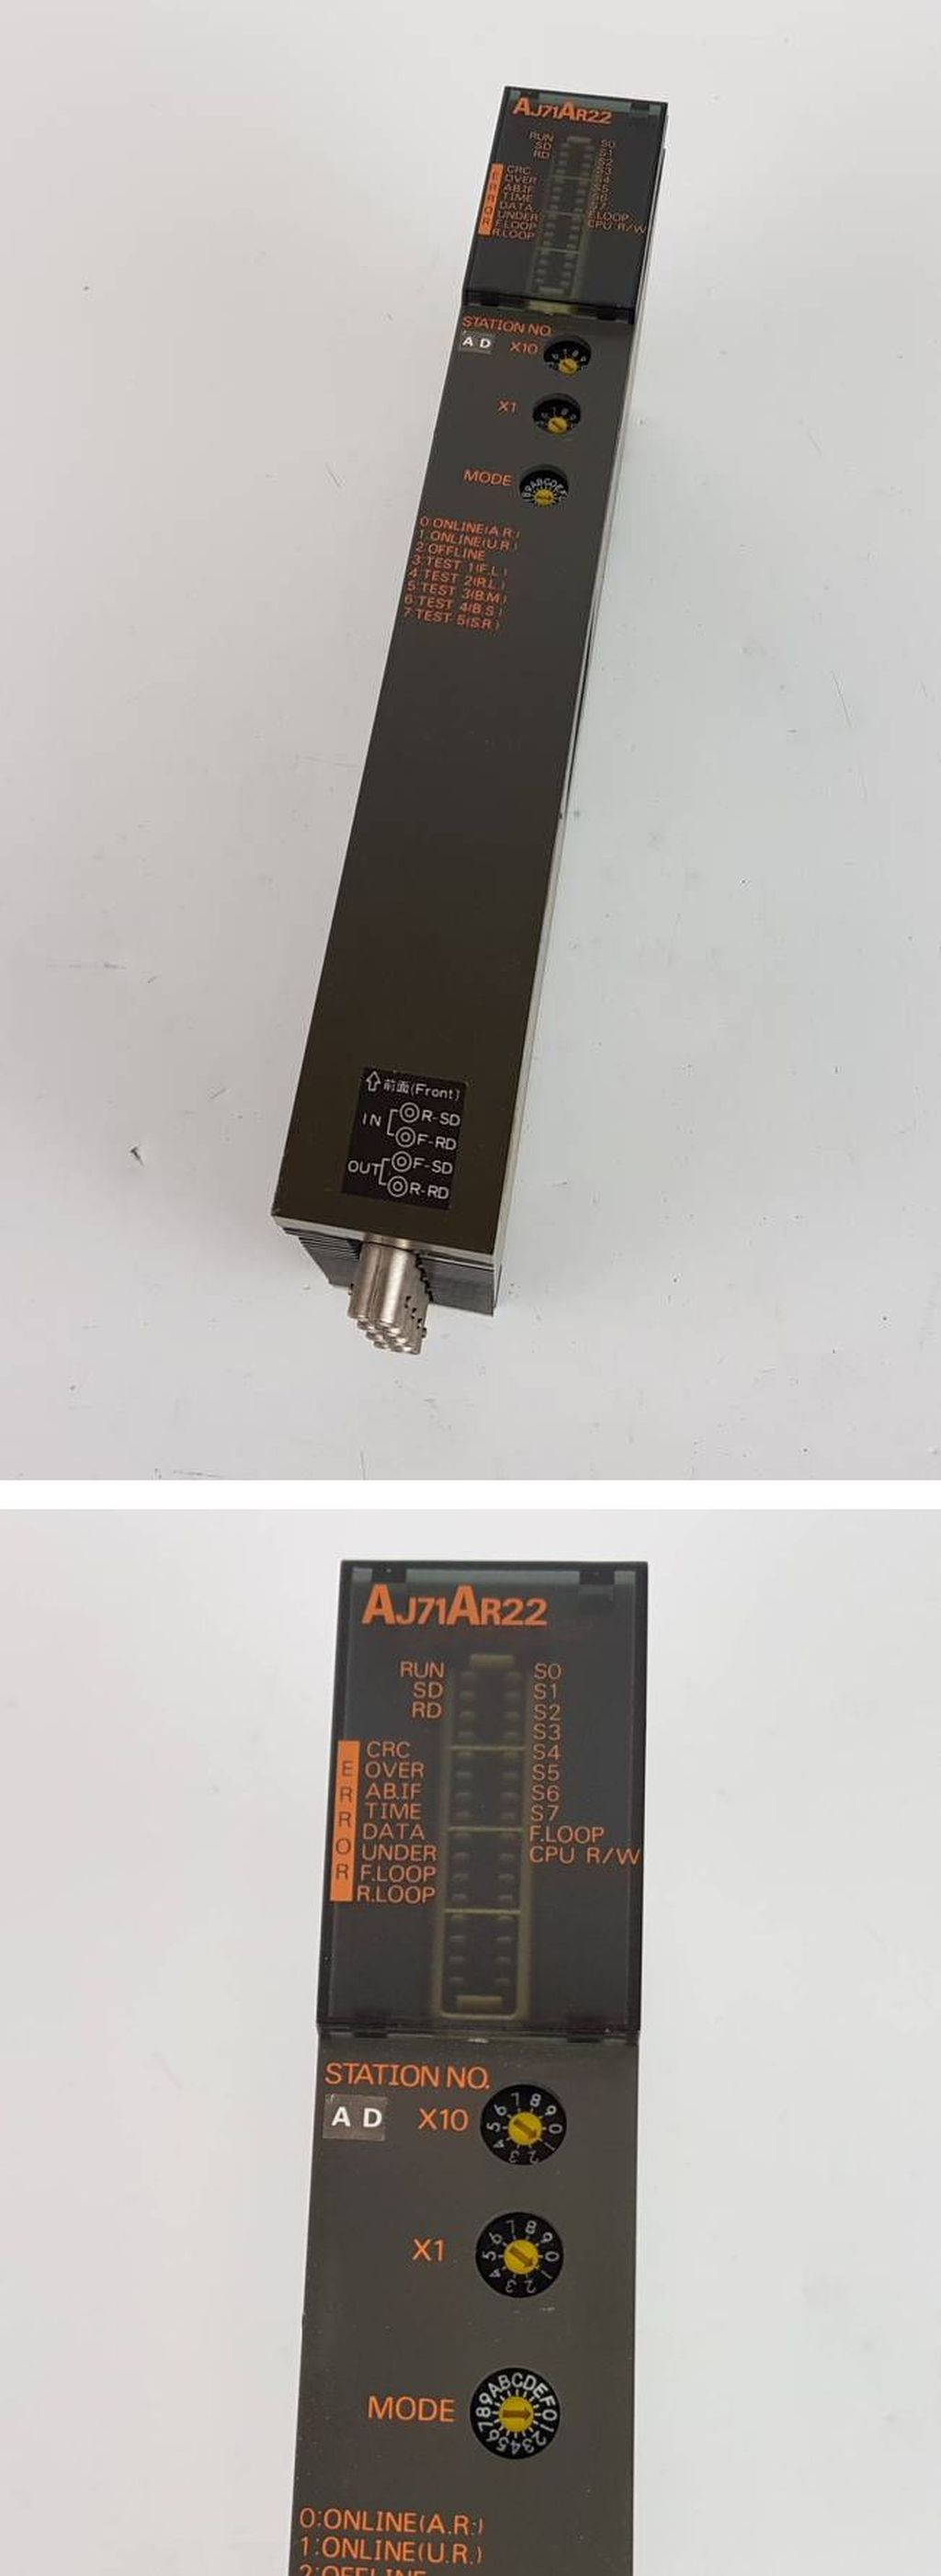 PP6283 Relais Platine ABB FRFAC A0 68001 16x Omron G3R 0DX02SN